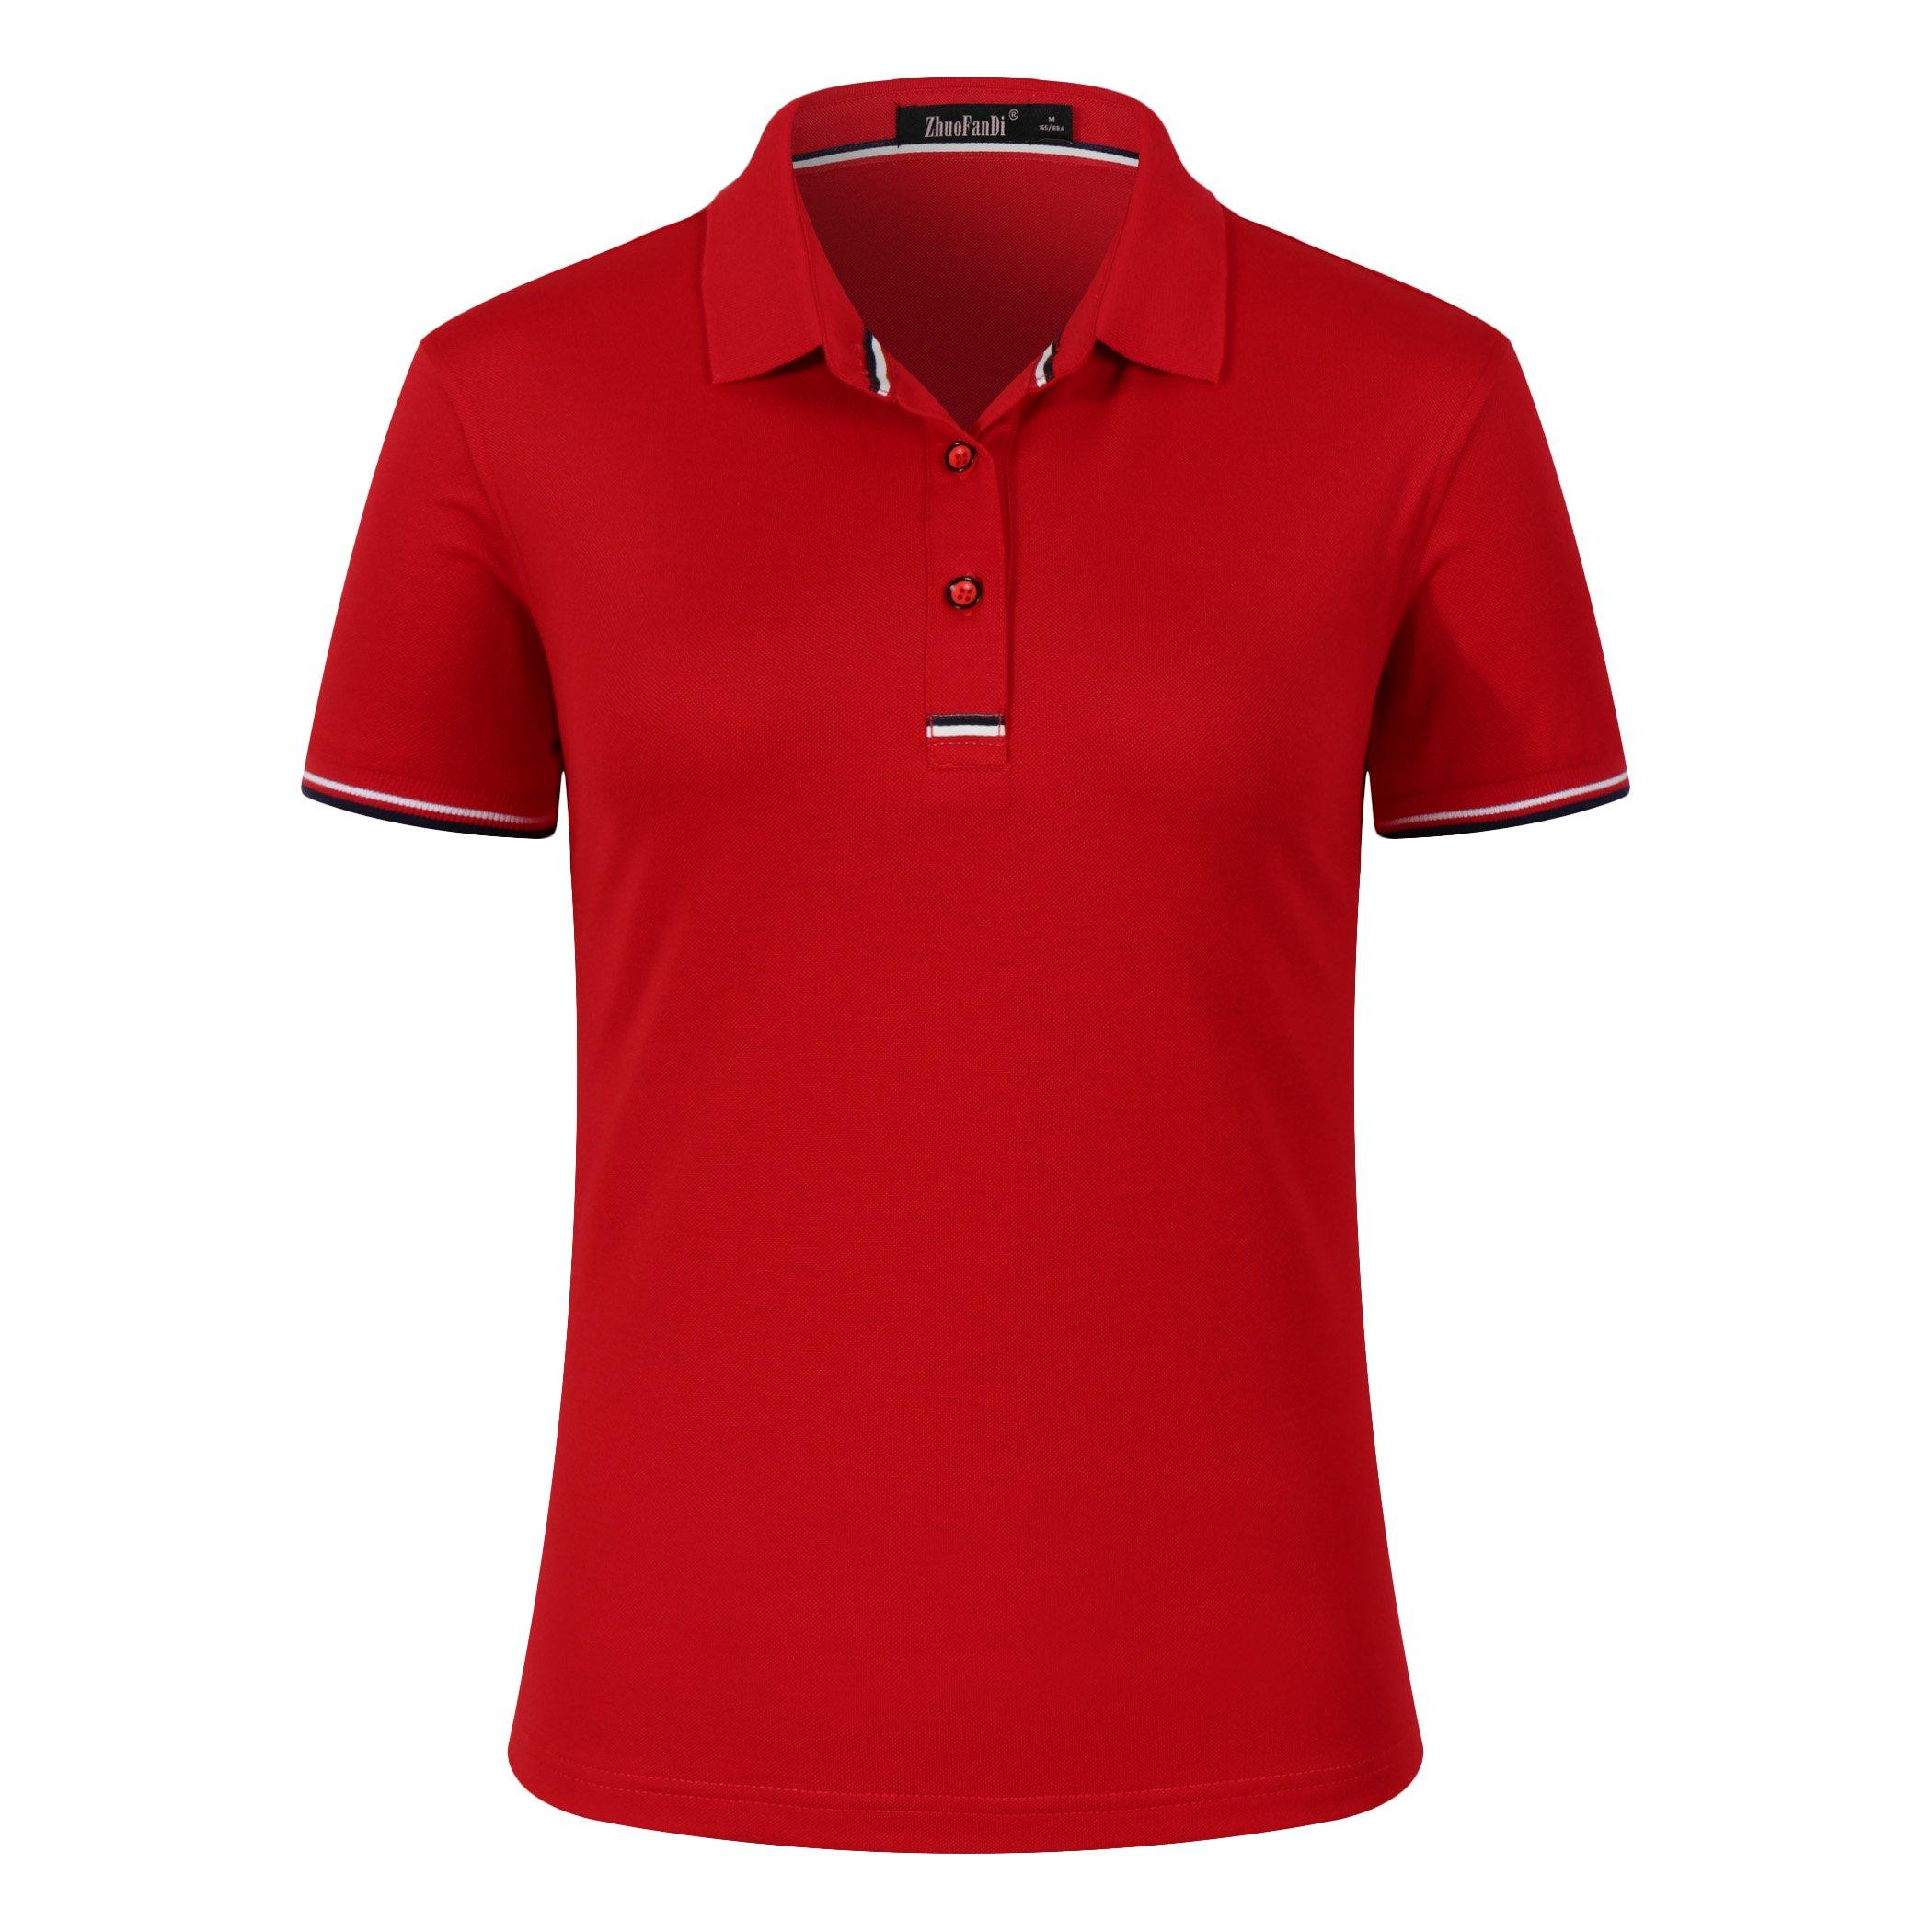 Mitario Femiego Women Classic Striped Collar Slim Fit Short Golf Polo Shirt Red S